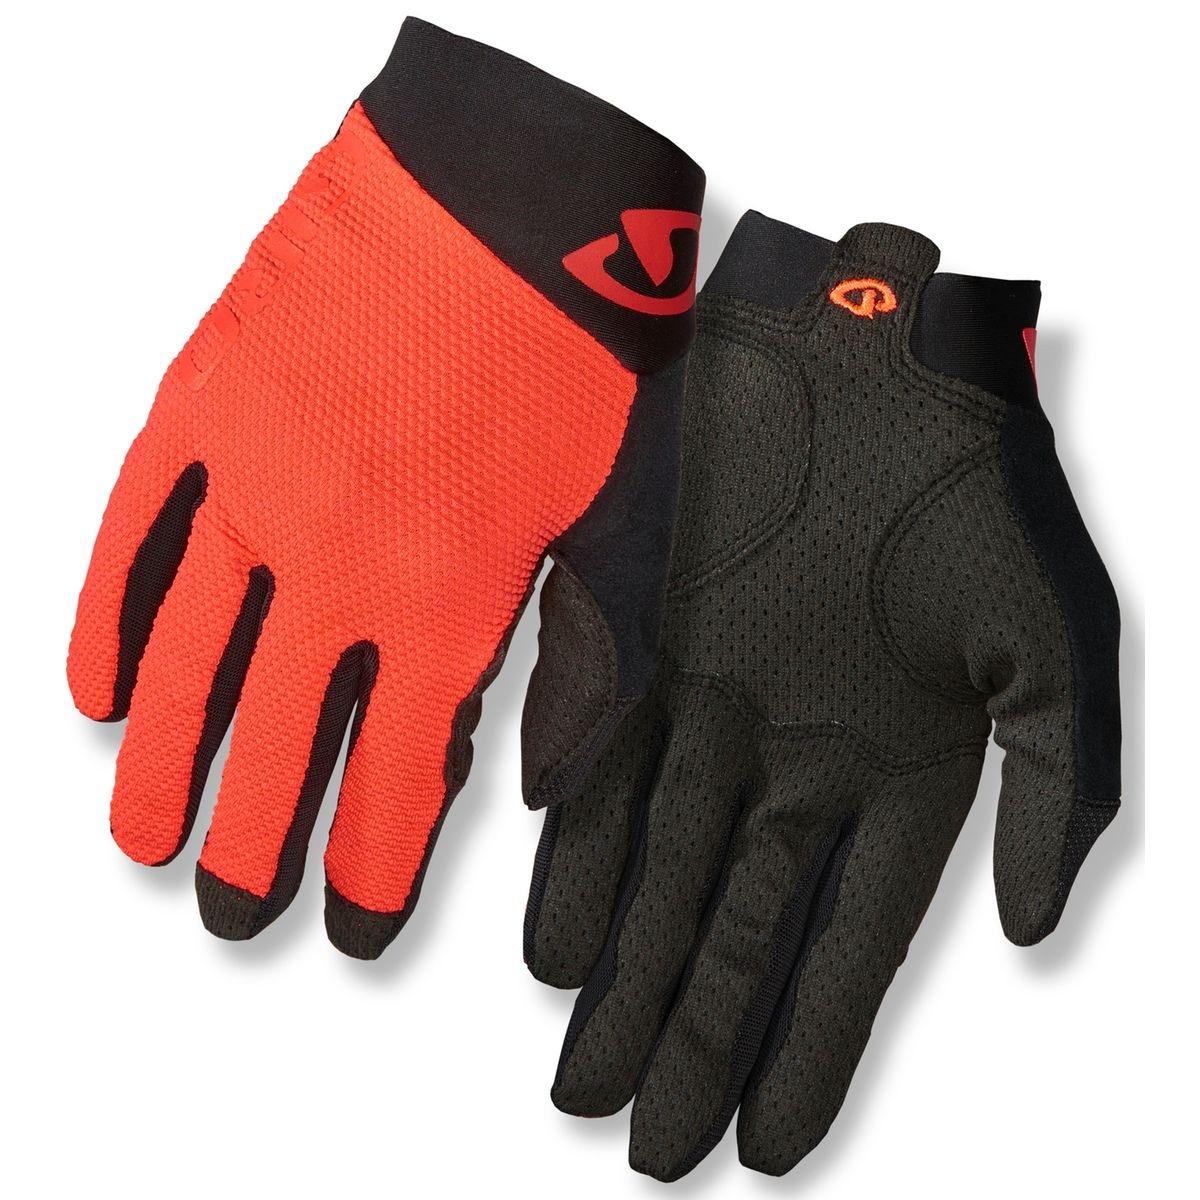 Rivet II - Gants Homme - orange/noir